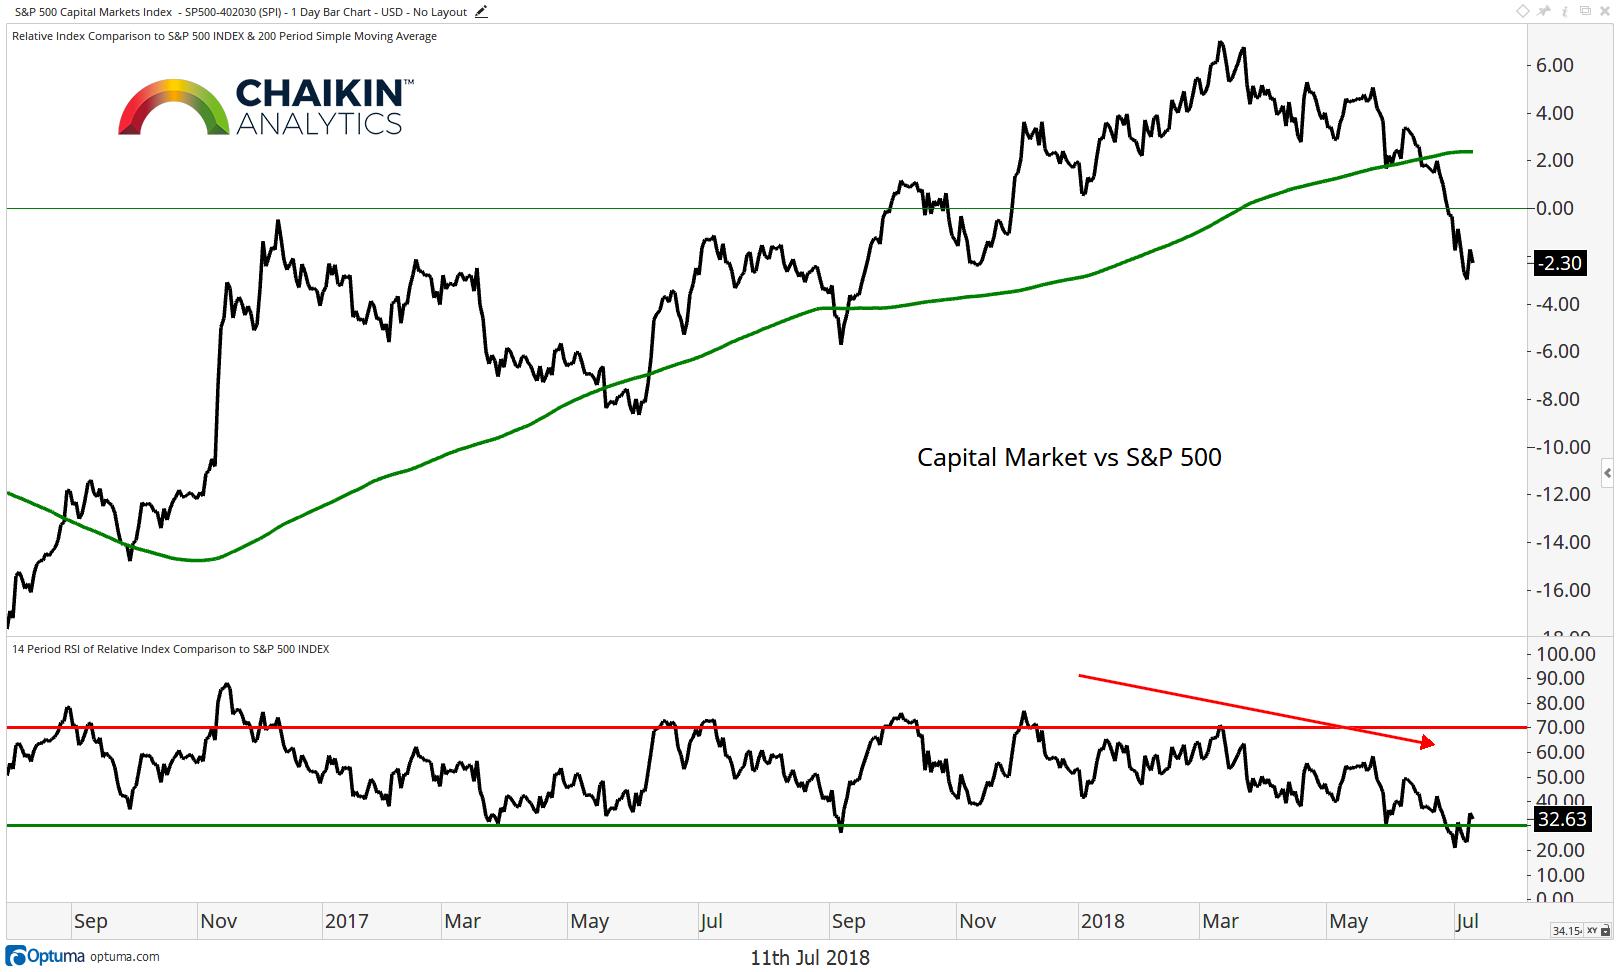 weak sector capital market vs broad stock index july 2018